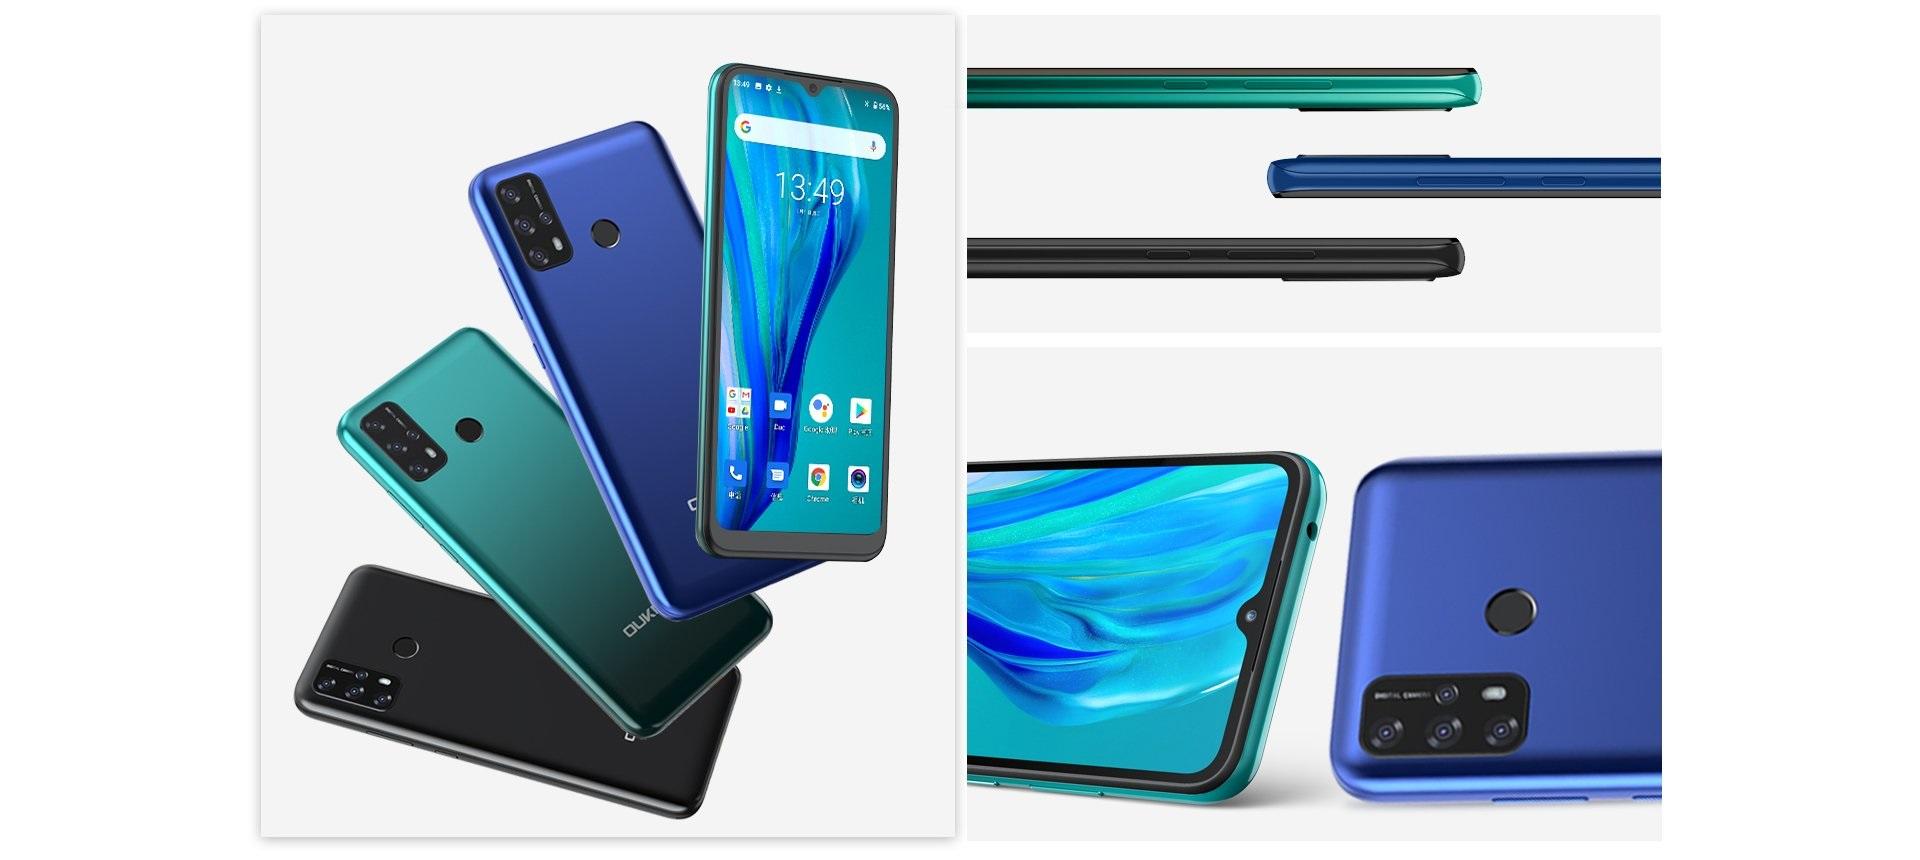 smartfon Oukitel C23 Pro smartphone